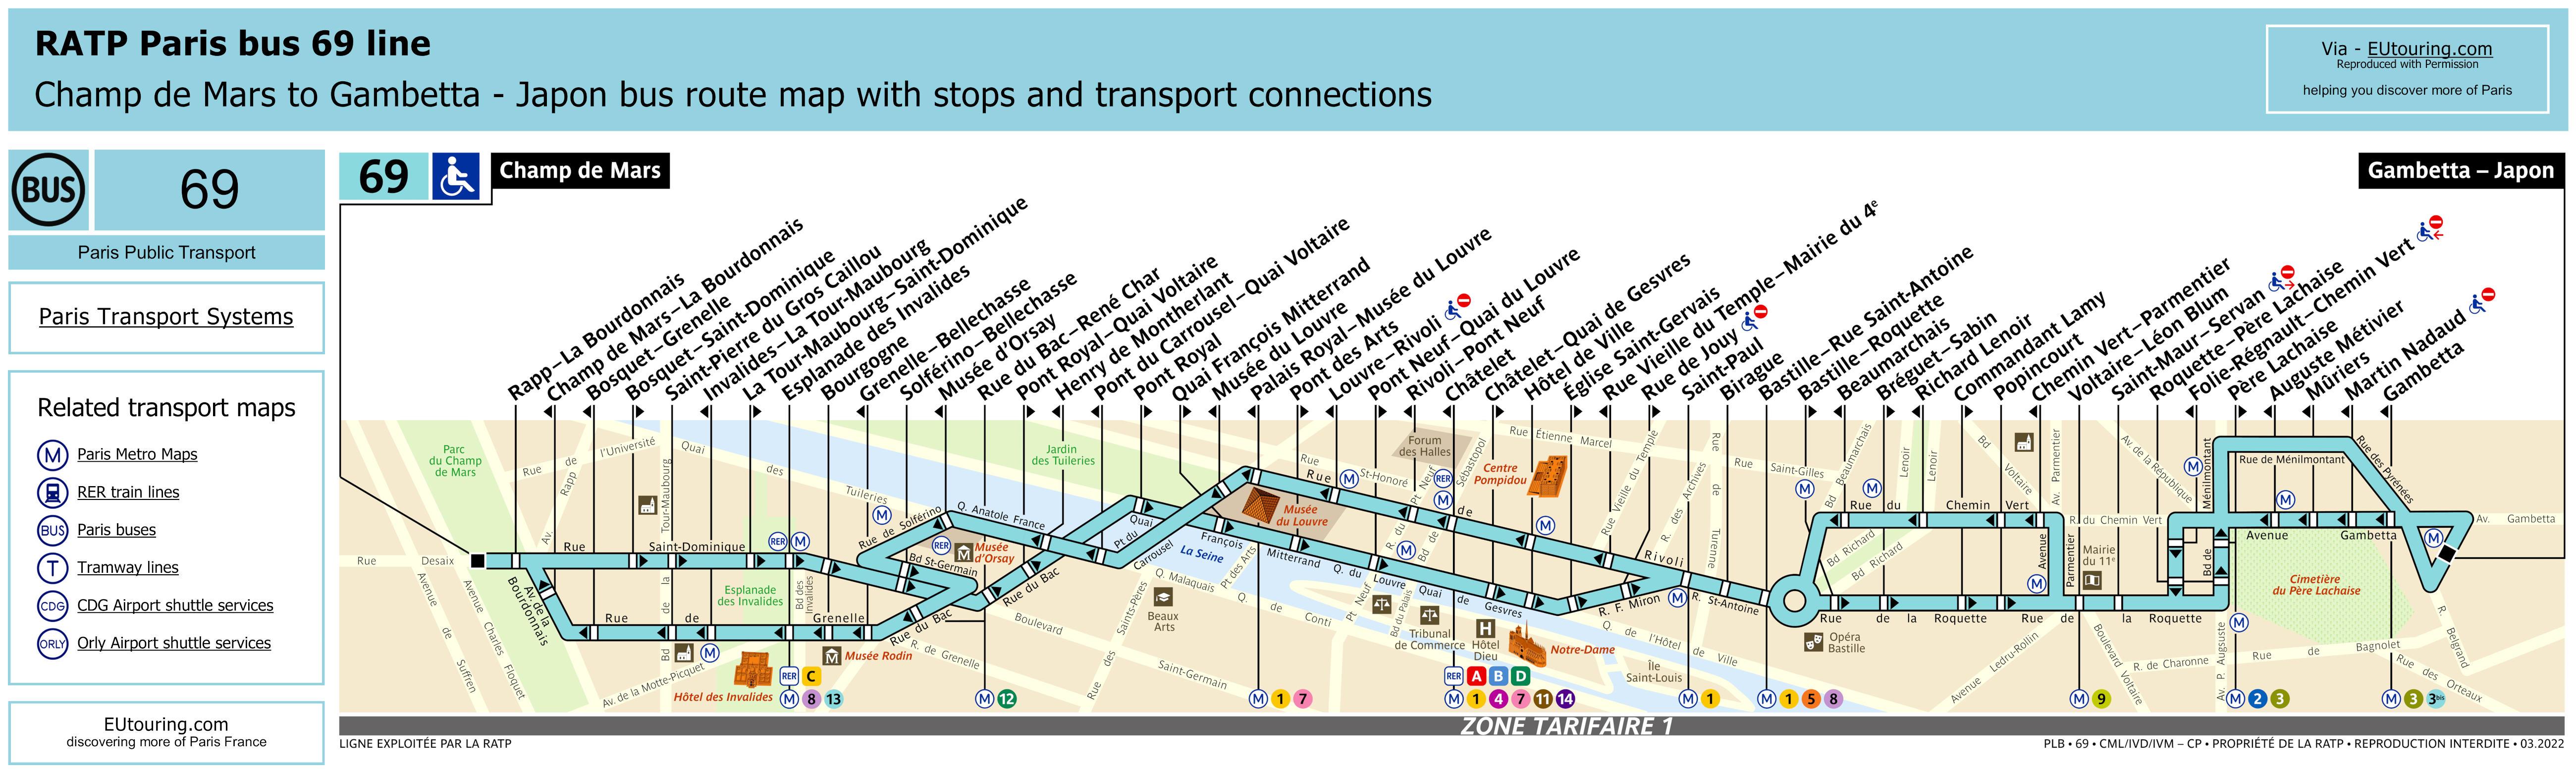 Ratp Route Maps For Paris Bus Lines 60 Through To 69